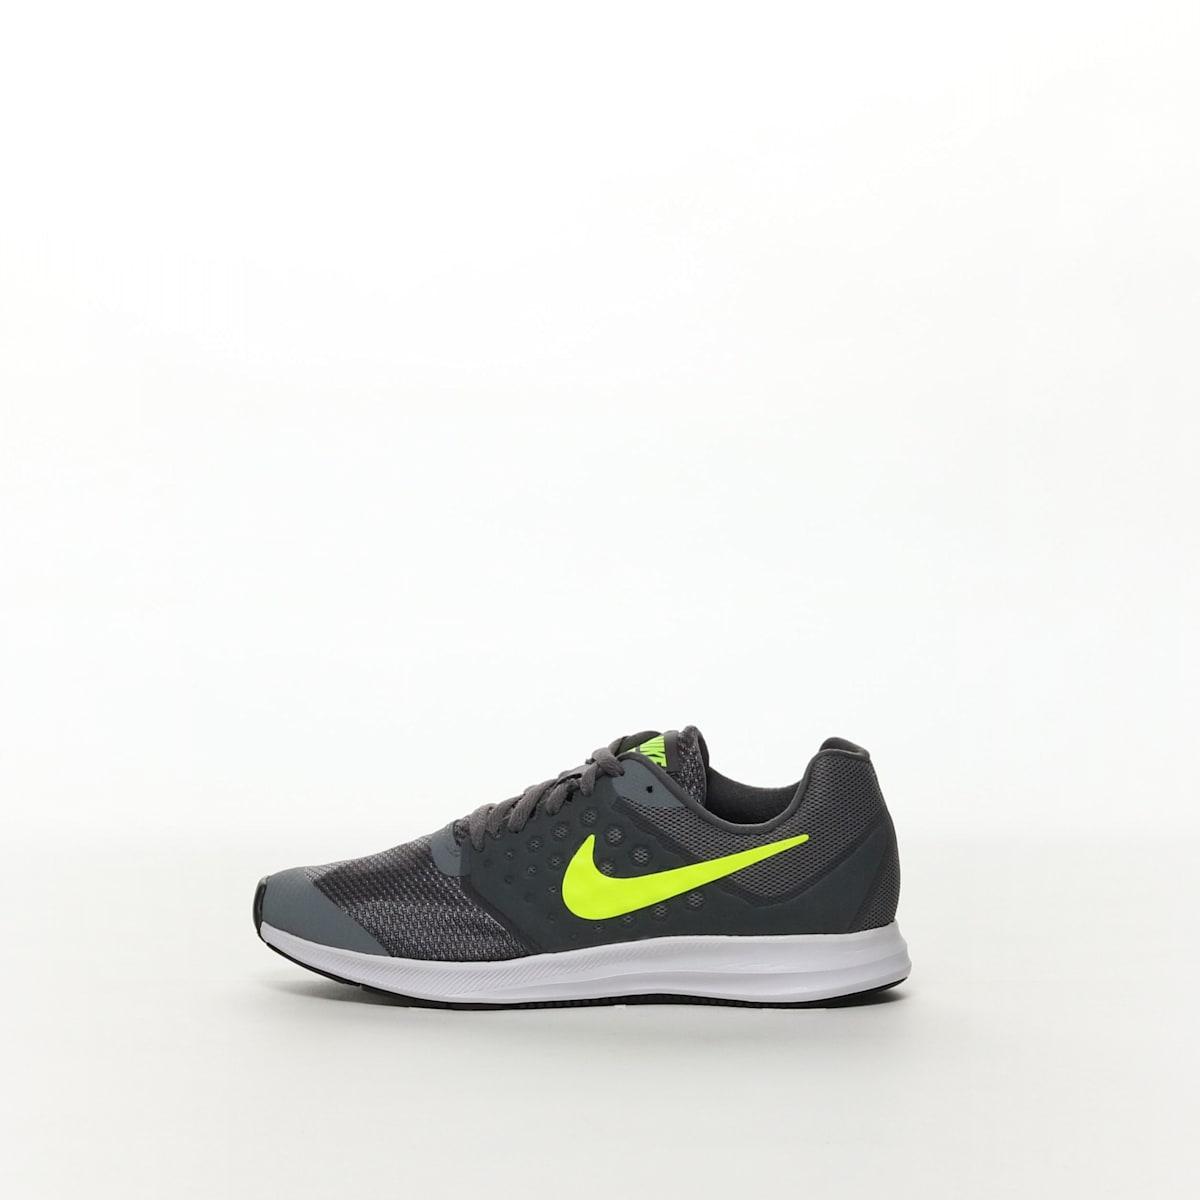 a93208c80a3 Boys  Nike Downshifter 7 (GS) Running Shoe - COL GY VOLT – Resku